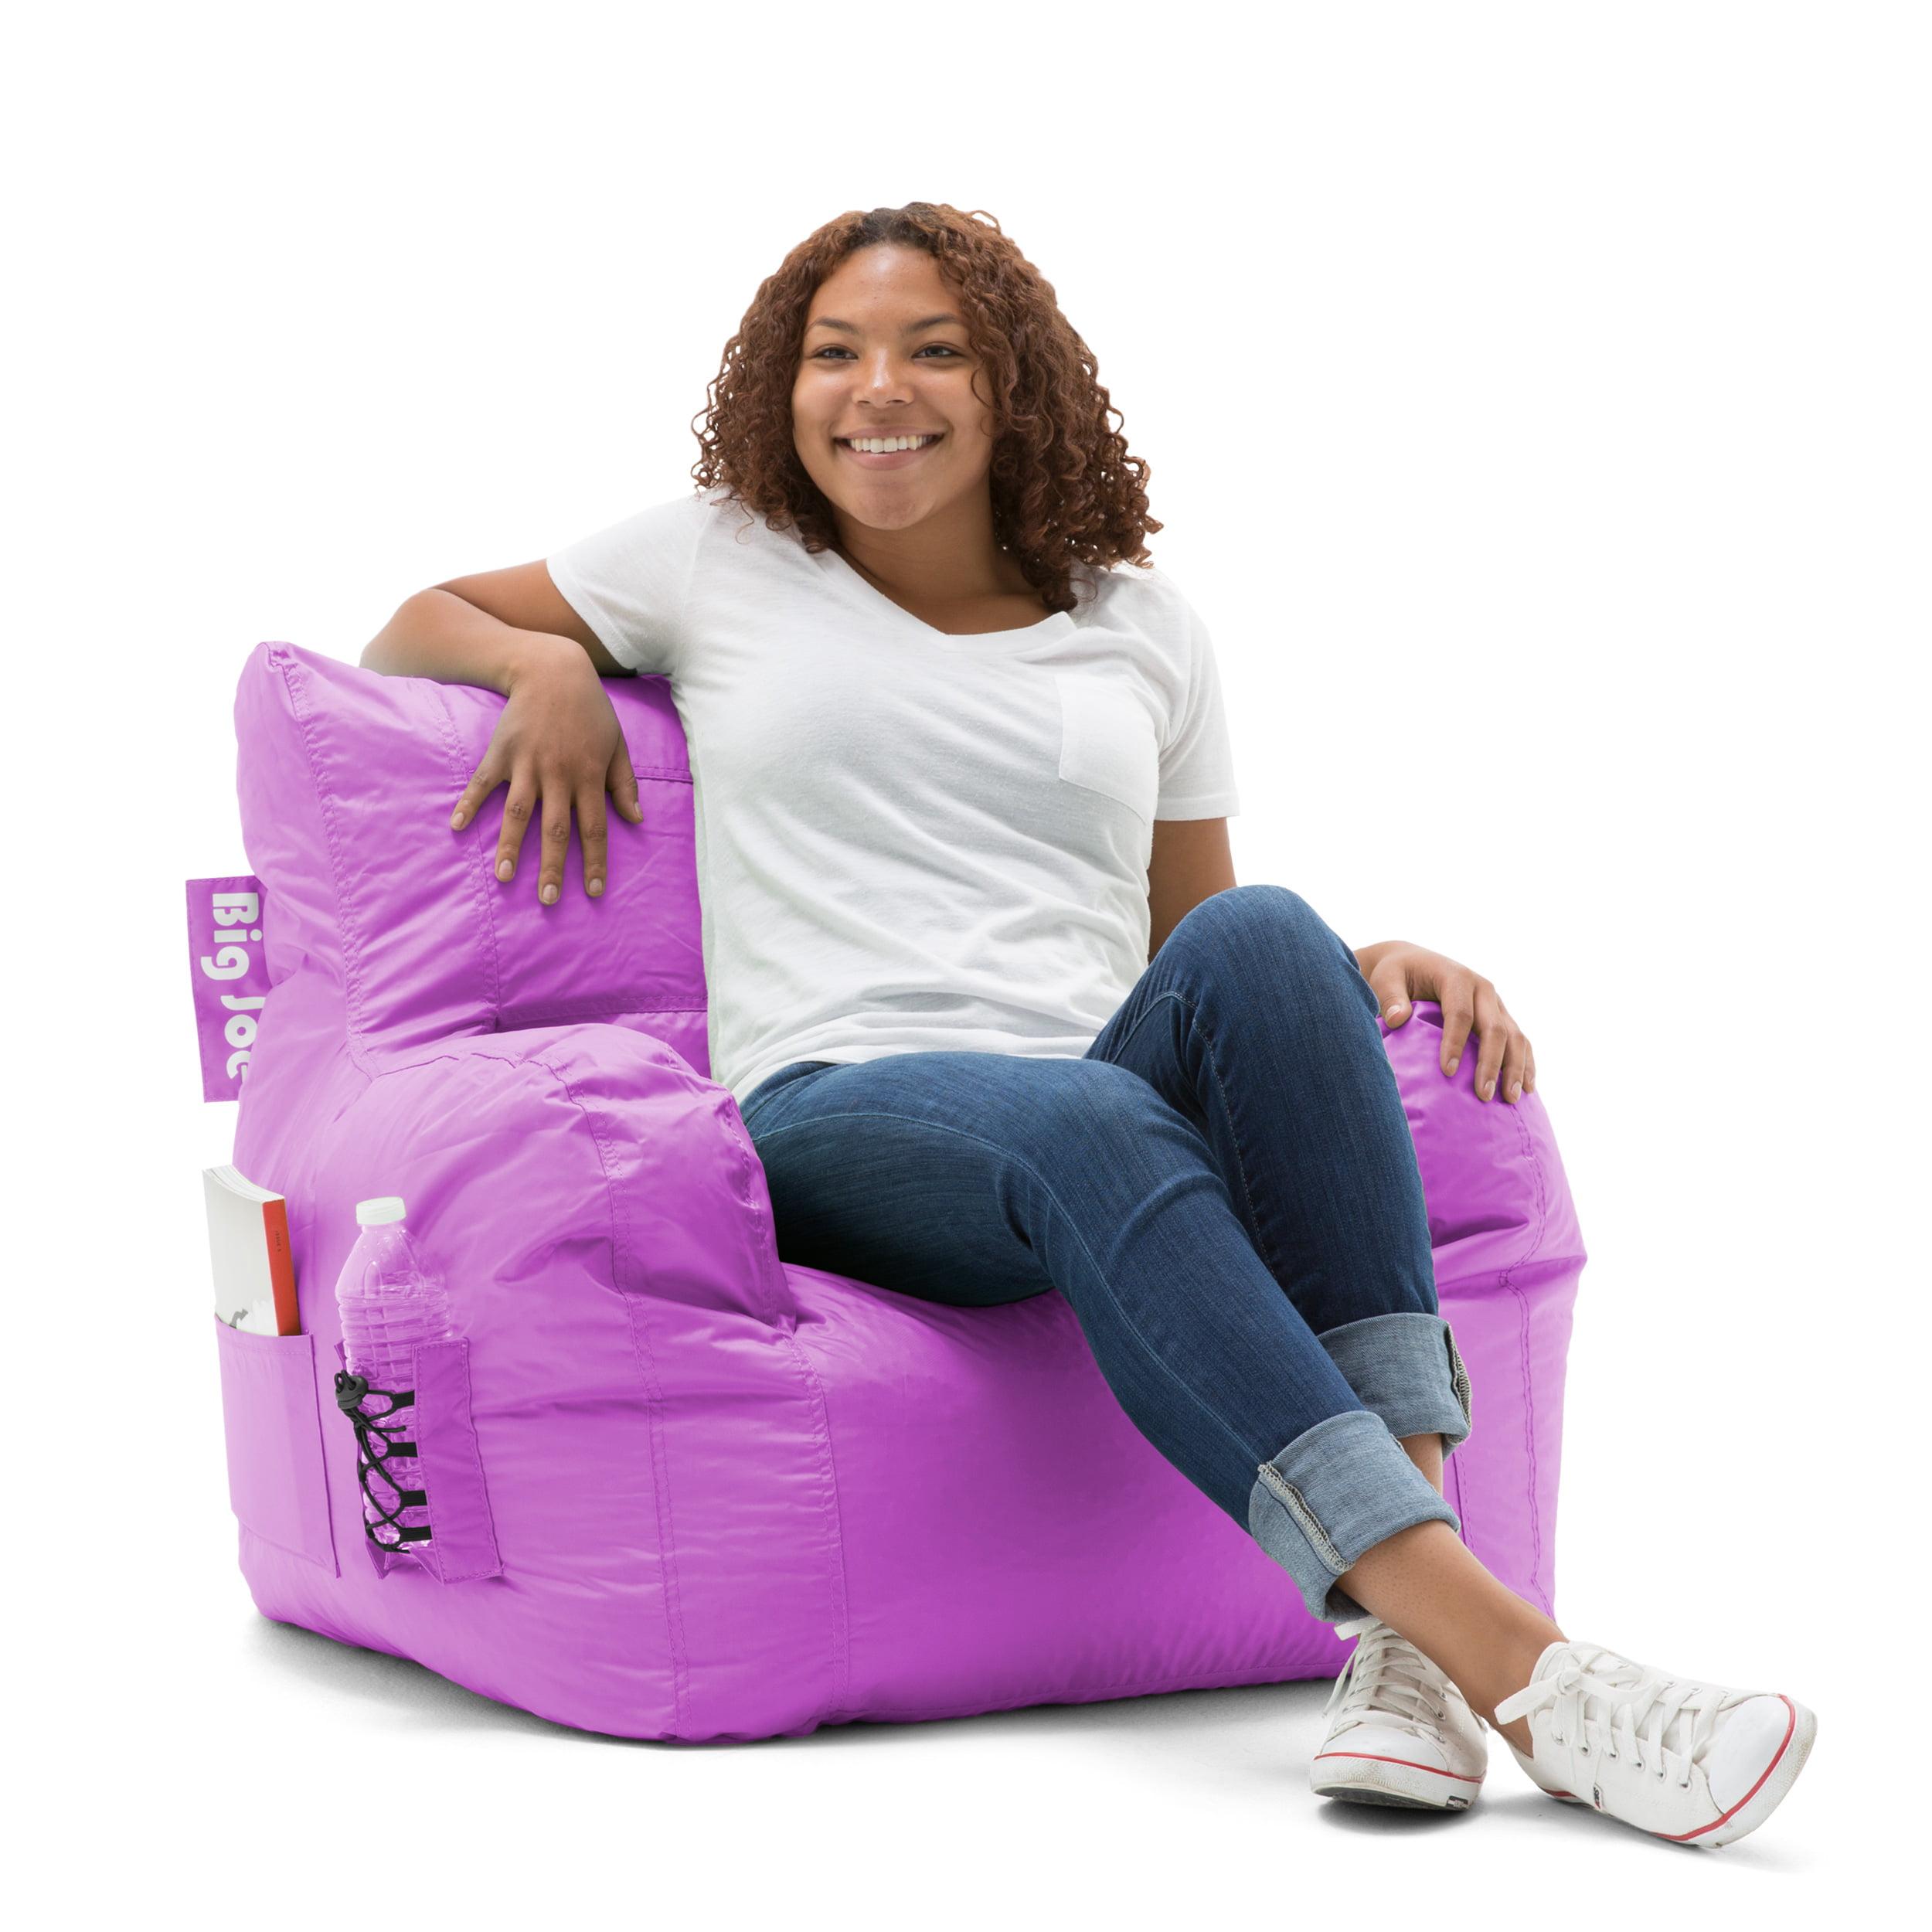 Peachy Big Joe Bean Bag Chair Multiple Colors 33 X 32 X 25 Ibusinesslaw Wood Chair Design Ideas Ibusinesslaworg